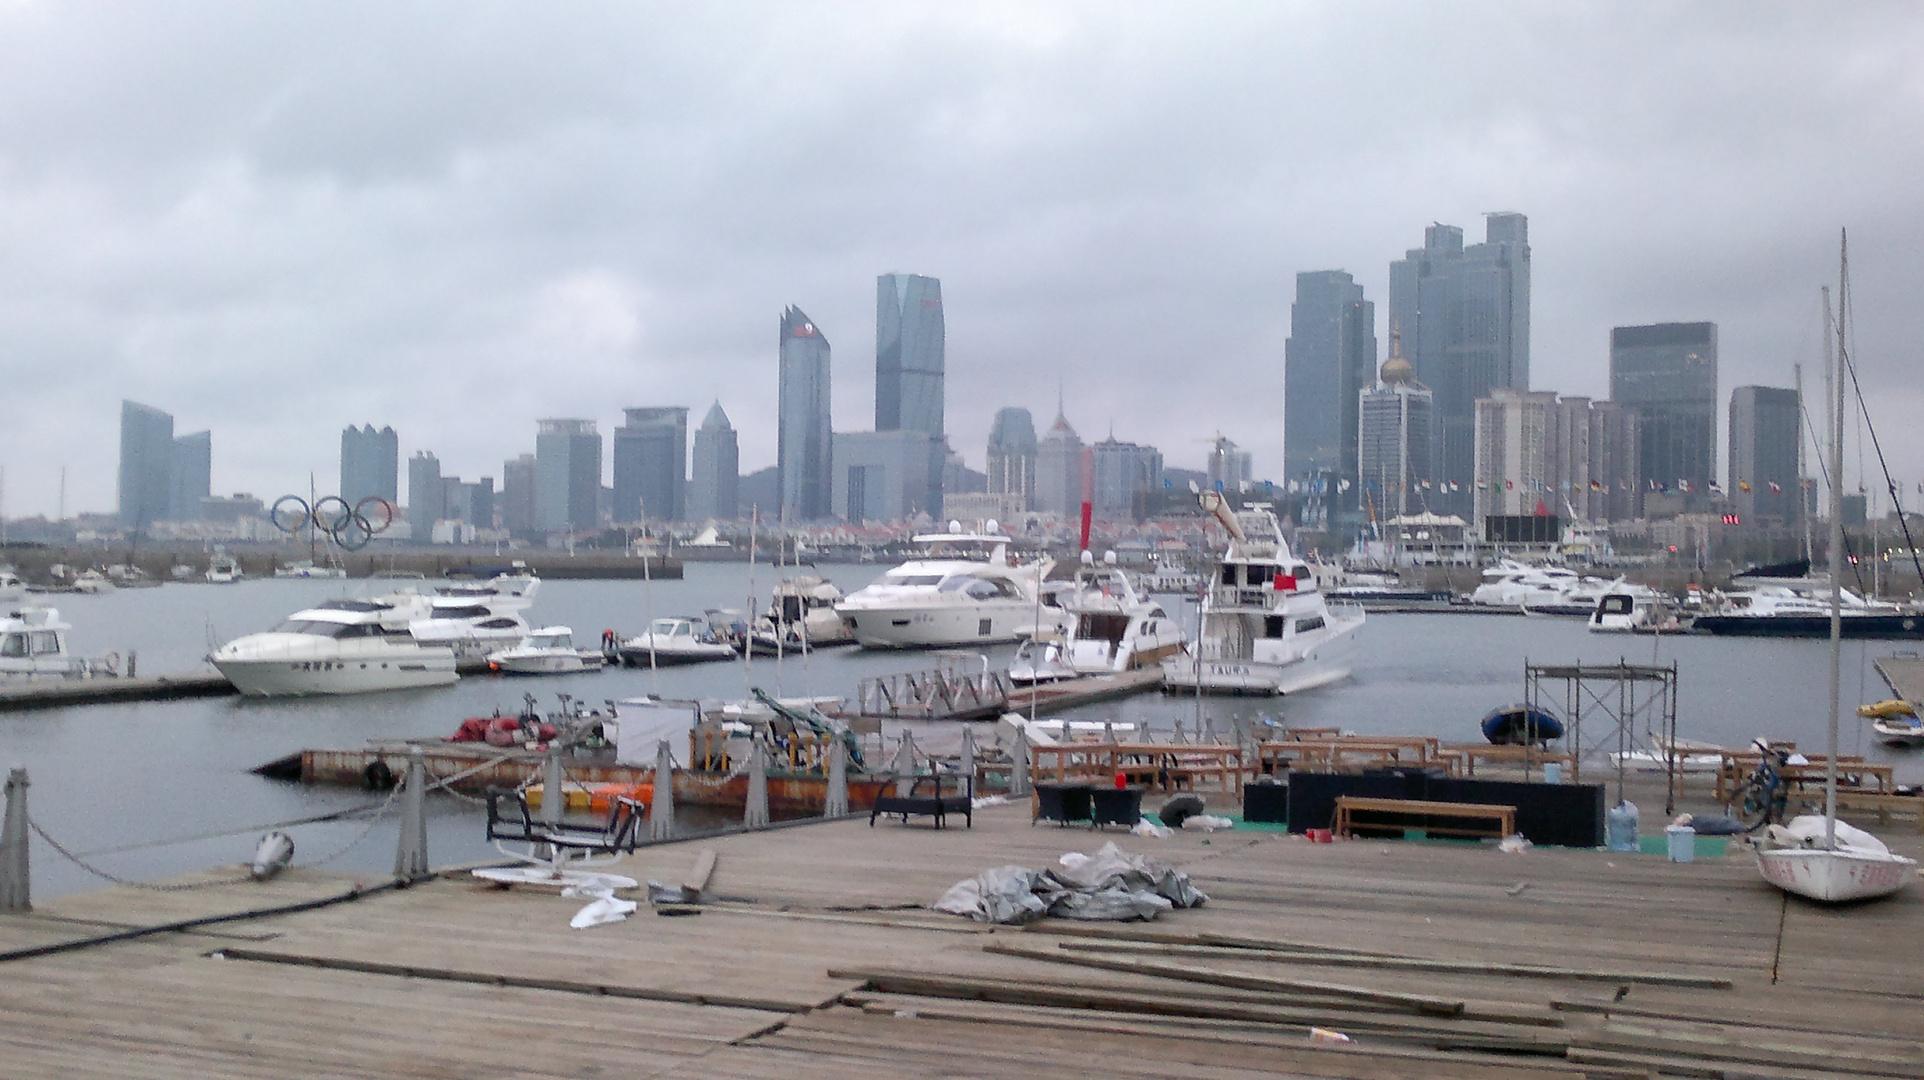 Qingdao (Tsingdao) Hafen beim Olympiagelände im Oktober 2012